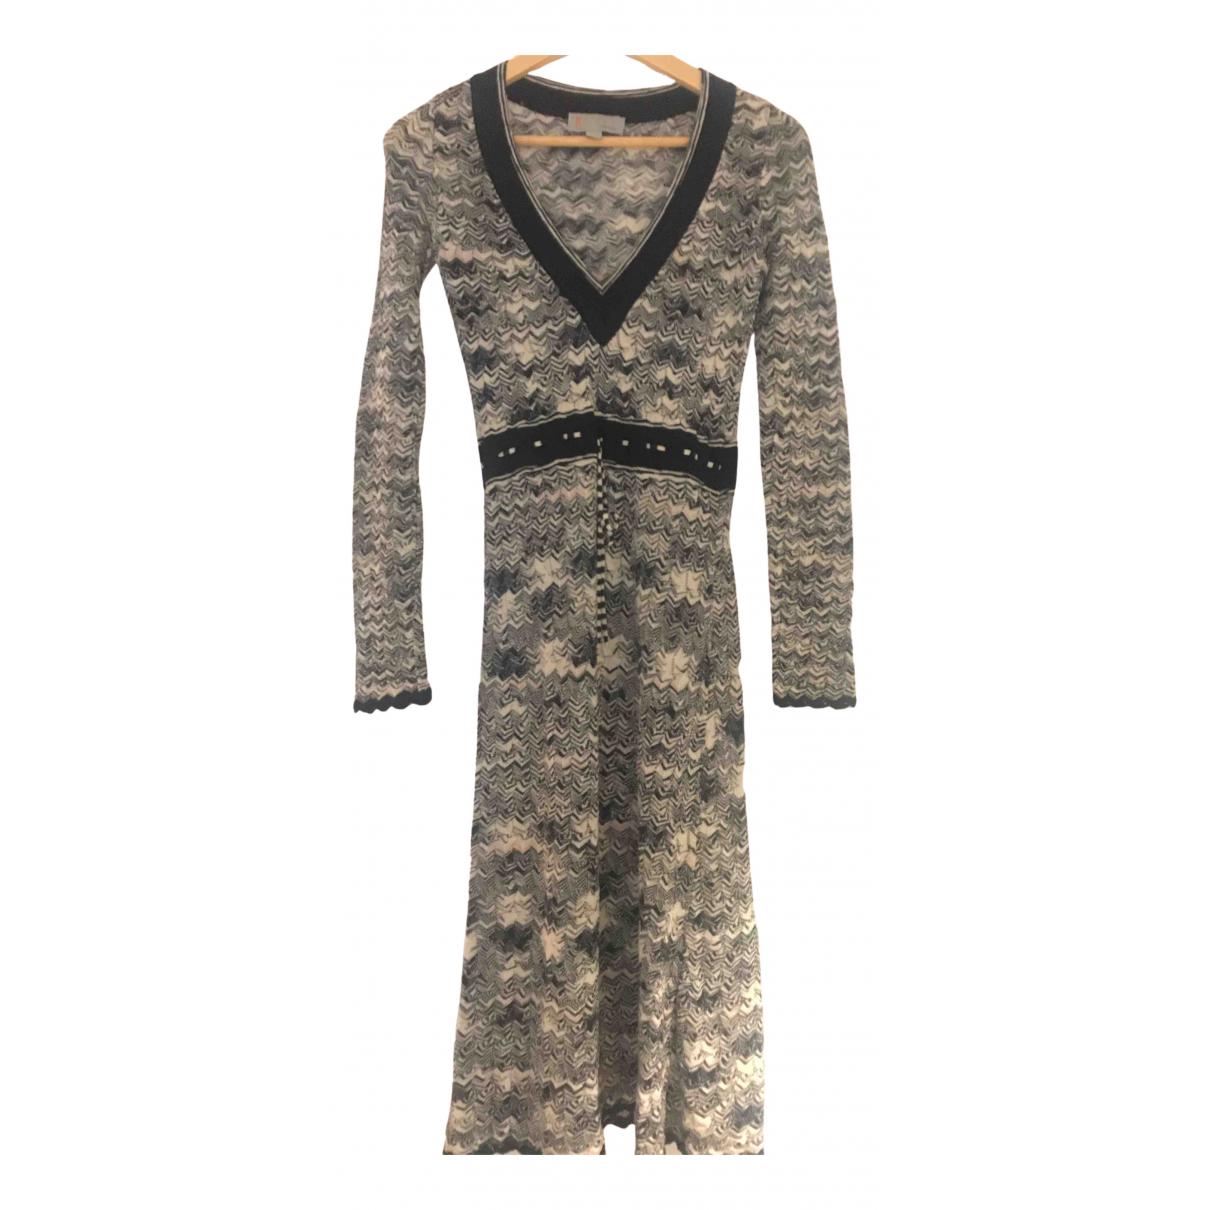 M Missoni N Multicolour Wool dress for Women 4 US